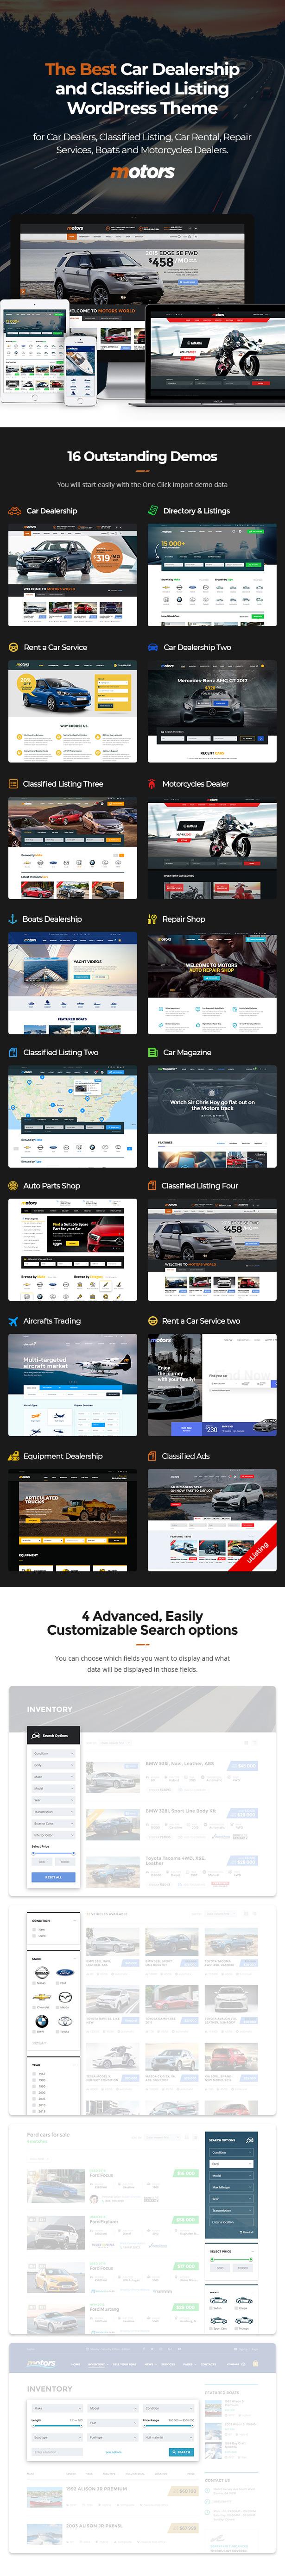 promo 1 - Motors - Car Dealer, Rental & Classifieds WordPress theme